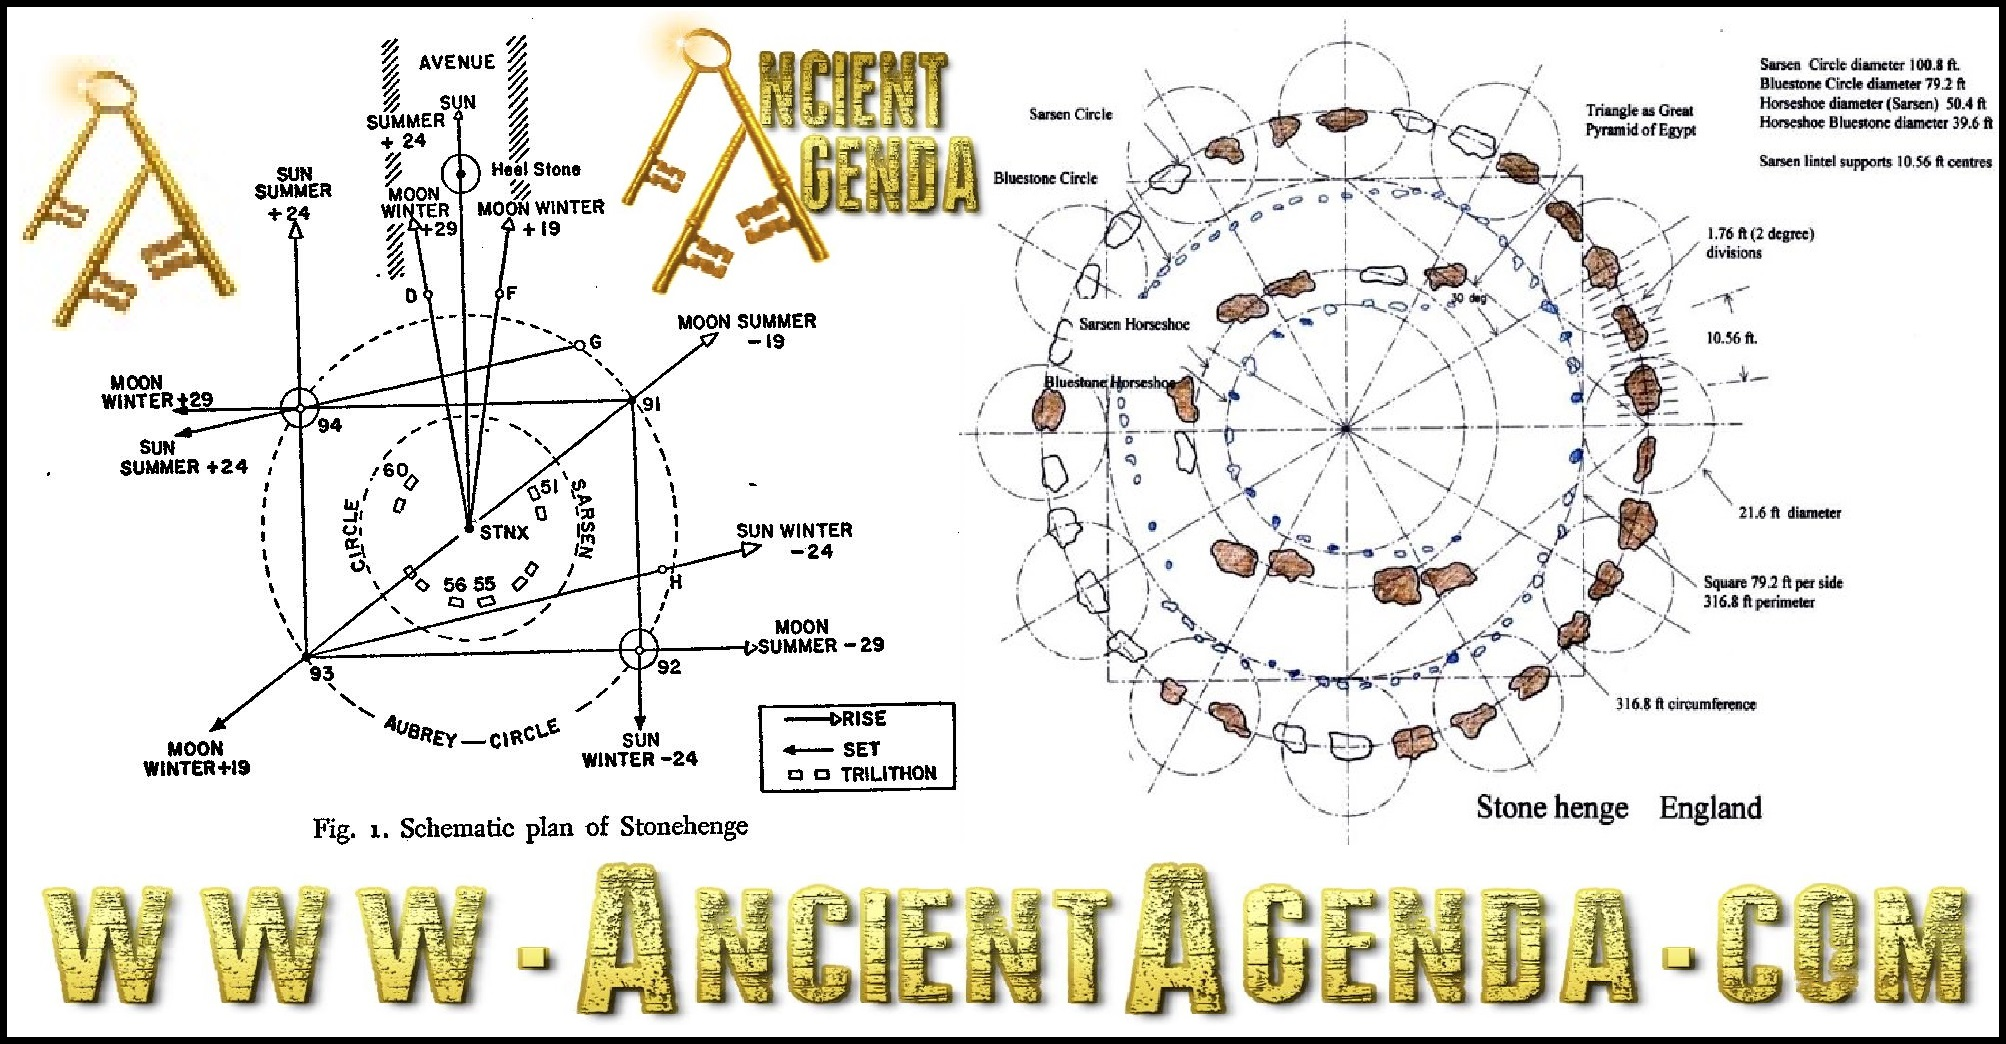 Codex 13 Geometria language